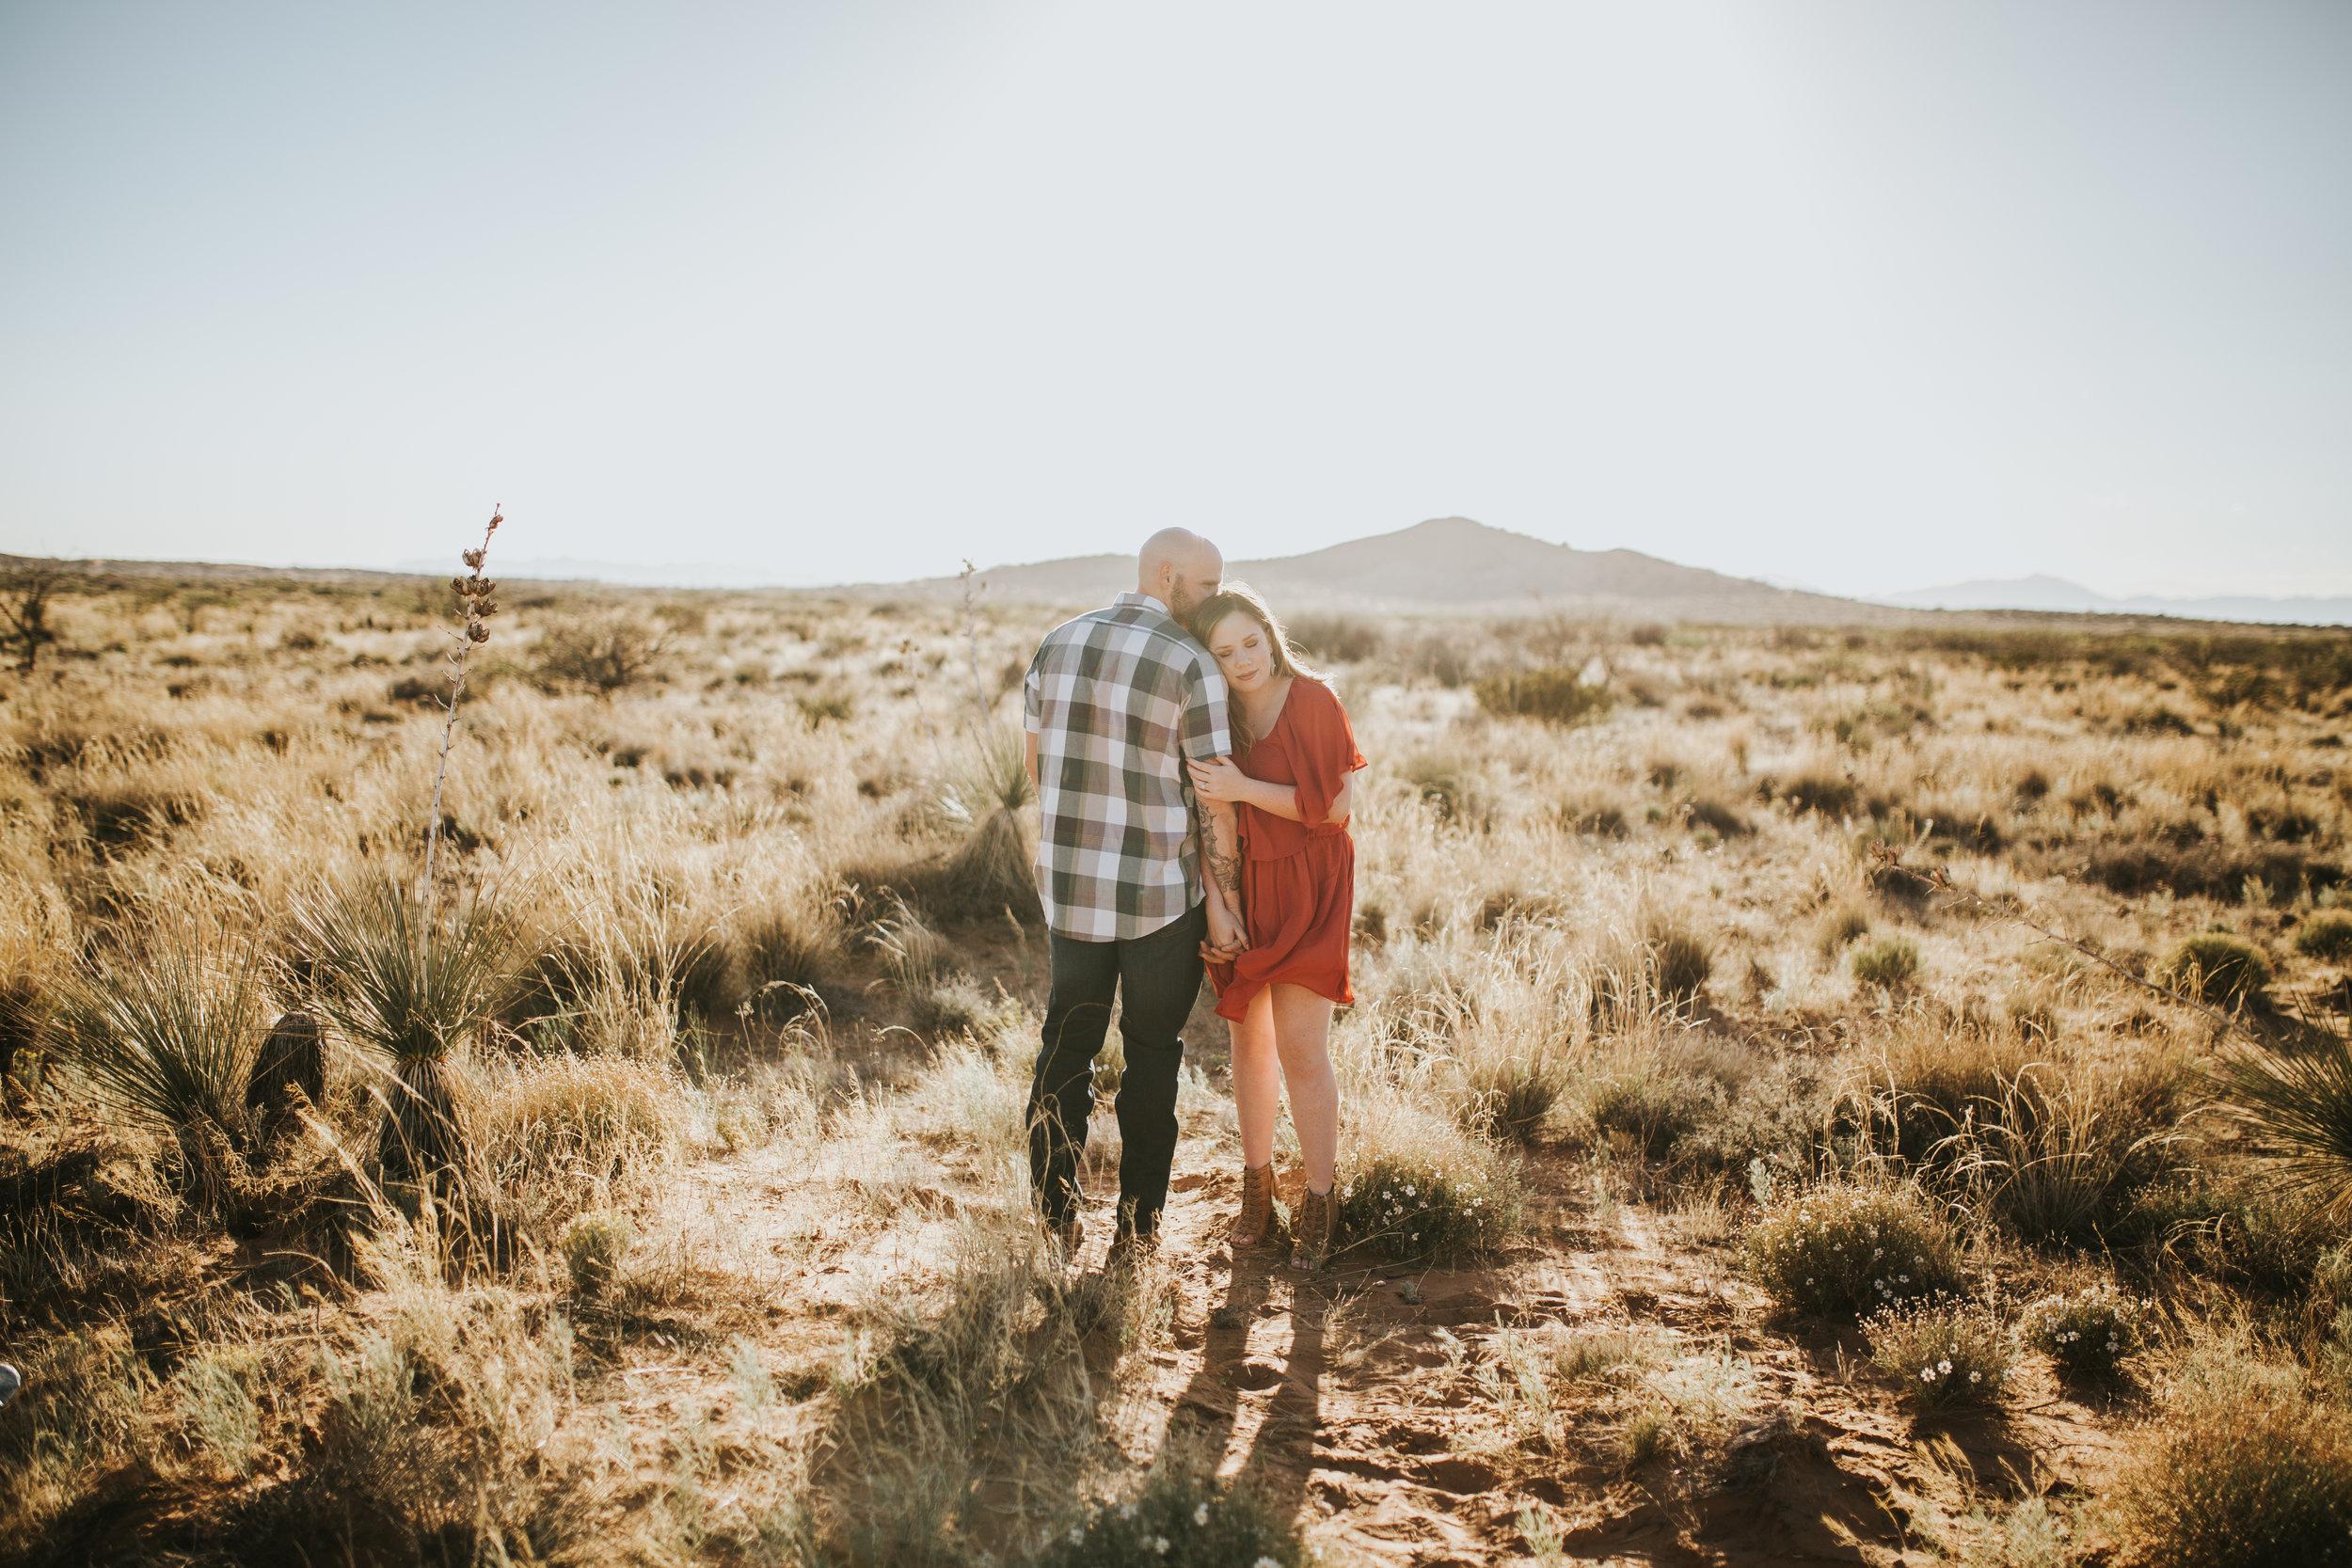 el-paso-elopement-and-wedding-photographer-7